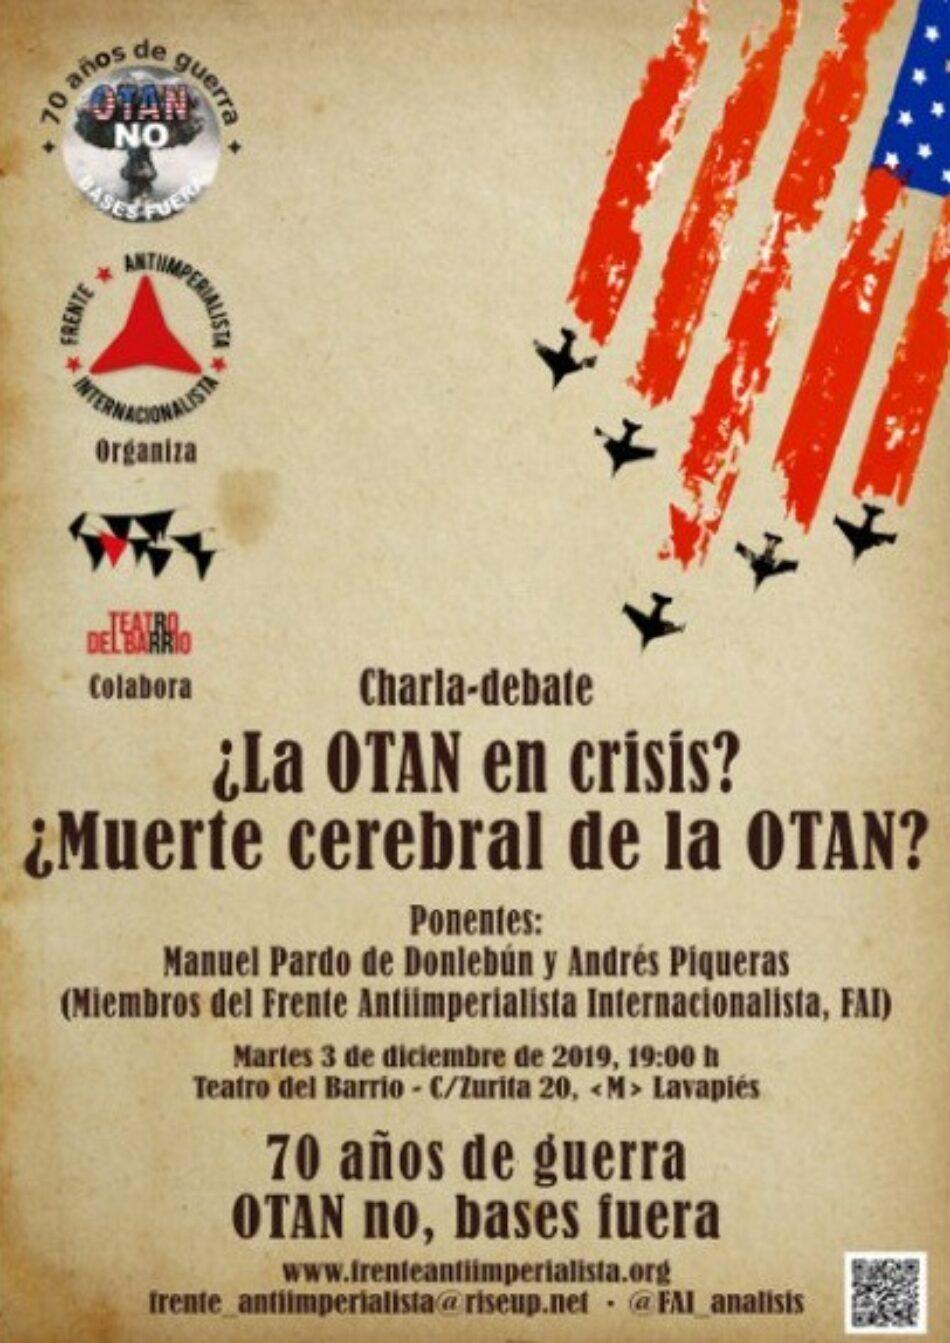 Convocatoria: «¿La OTAN en crisis?¿Muerte cerebral de la OTAN?»